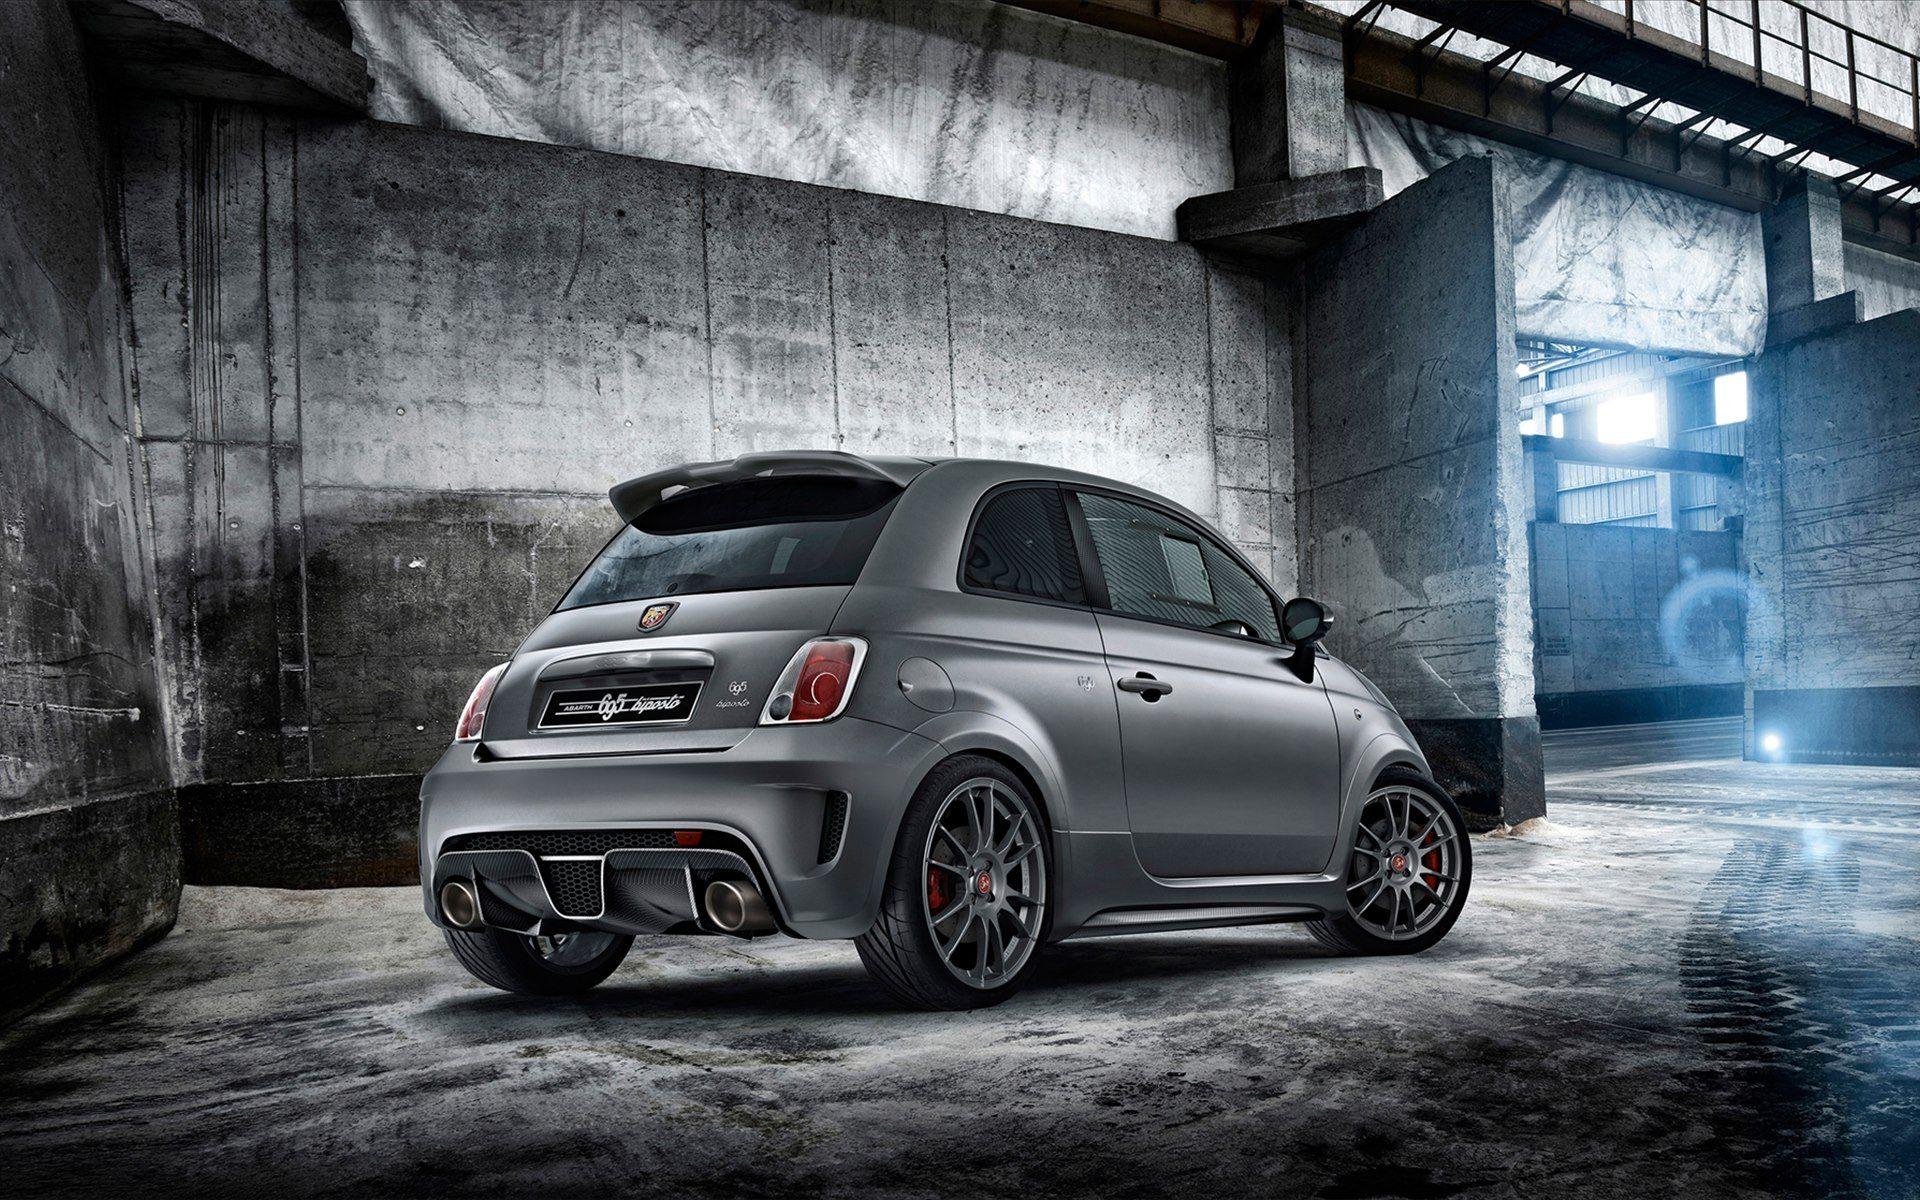 2014 Fiat Abarth 695 Biposto 2 Wallpaper Hd Car Wallpapers Id 4392